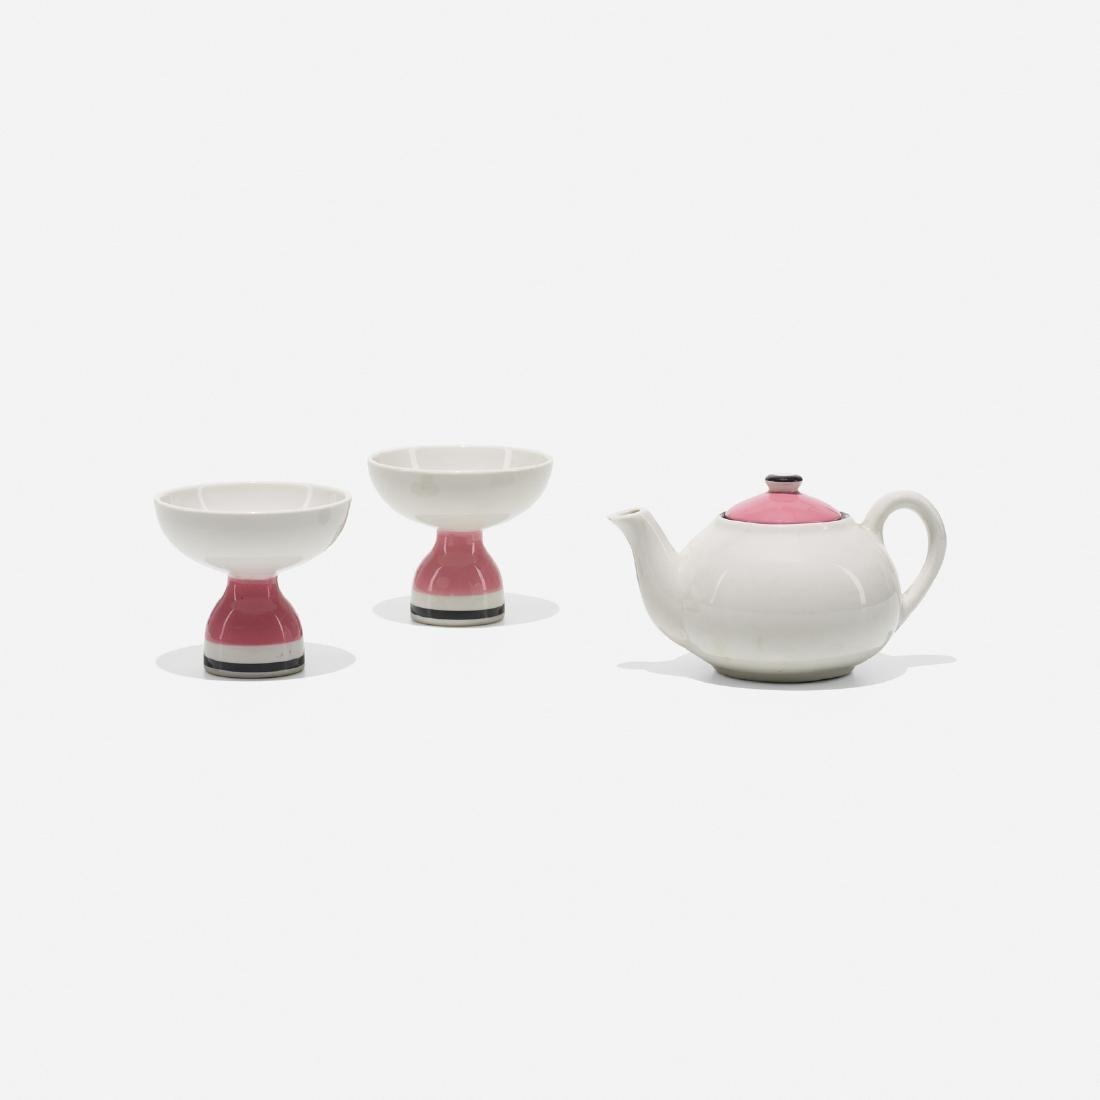 Girard, teapot & two footed bowls, La Fonda del Sol